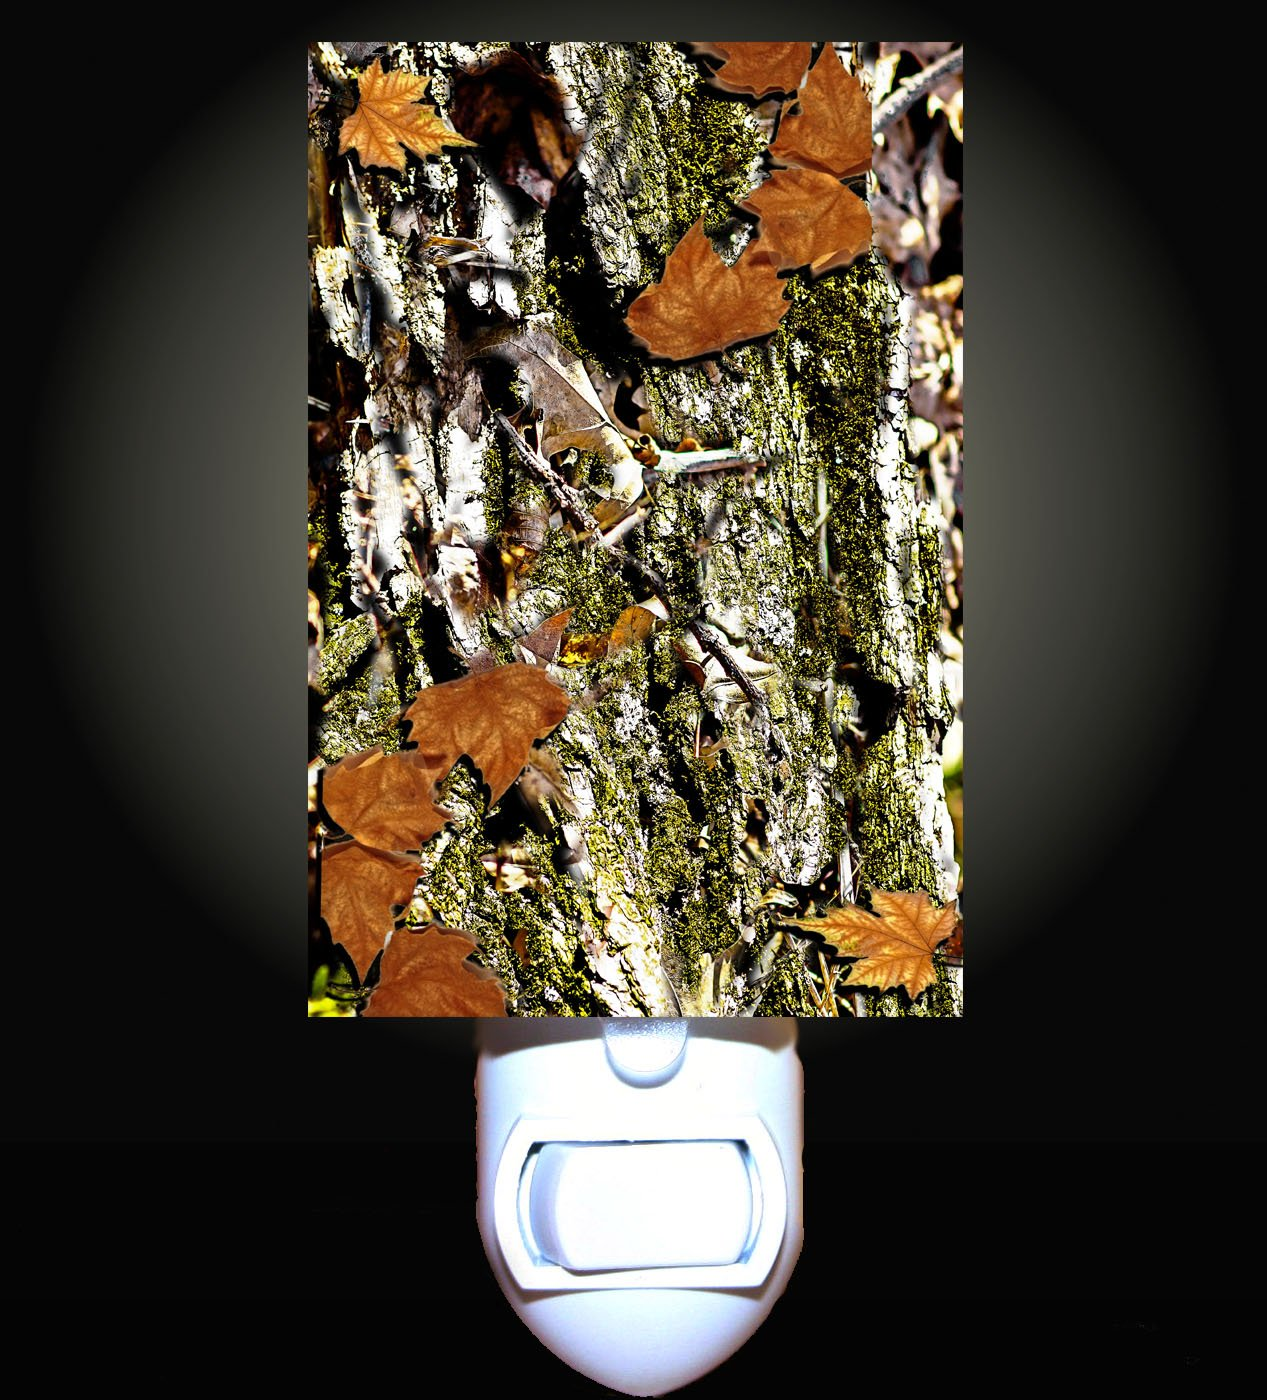 Mossy Oak Break Upパターン装飾夜ライト B001LAGEWQ